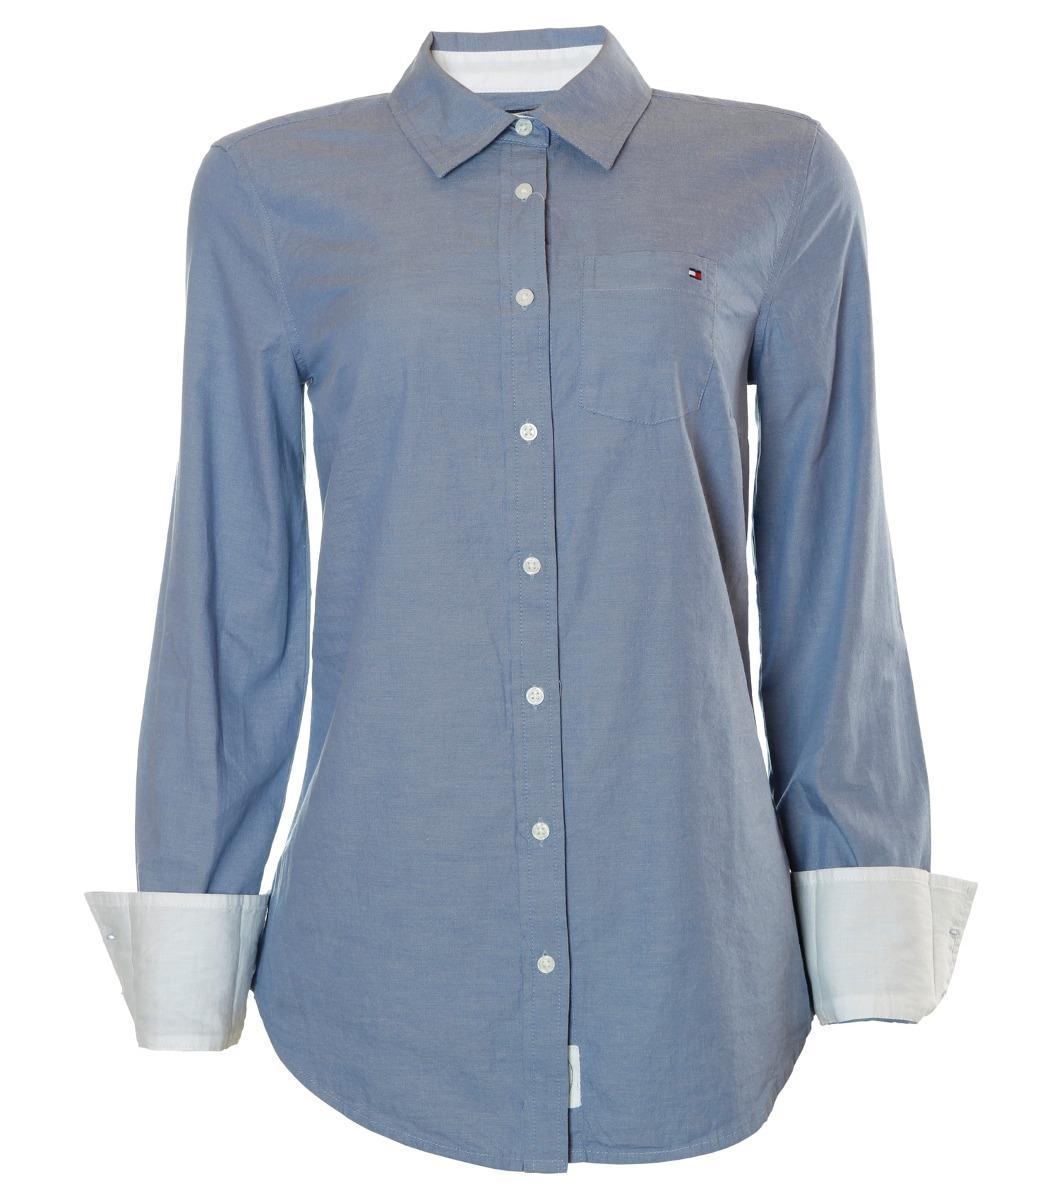 a8eee3fbe Camisa Social Feminina Tommy Hilfiger Link Blue - R$ 389,87 em ...